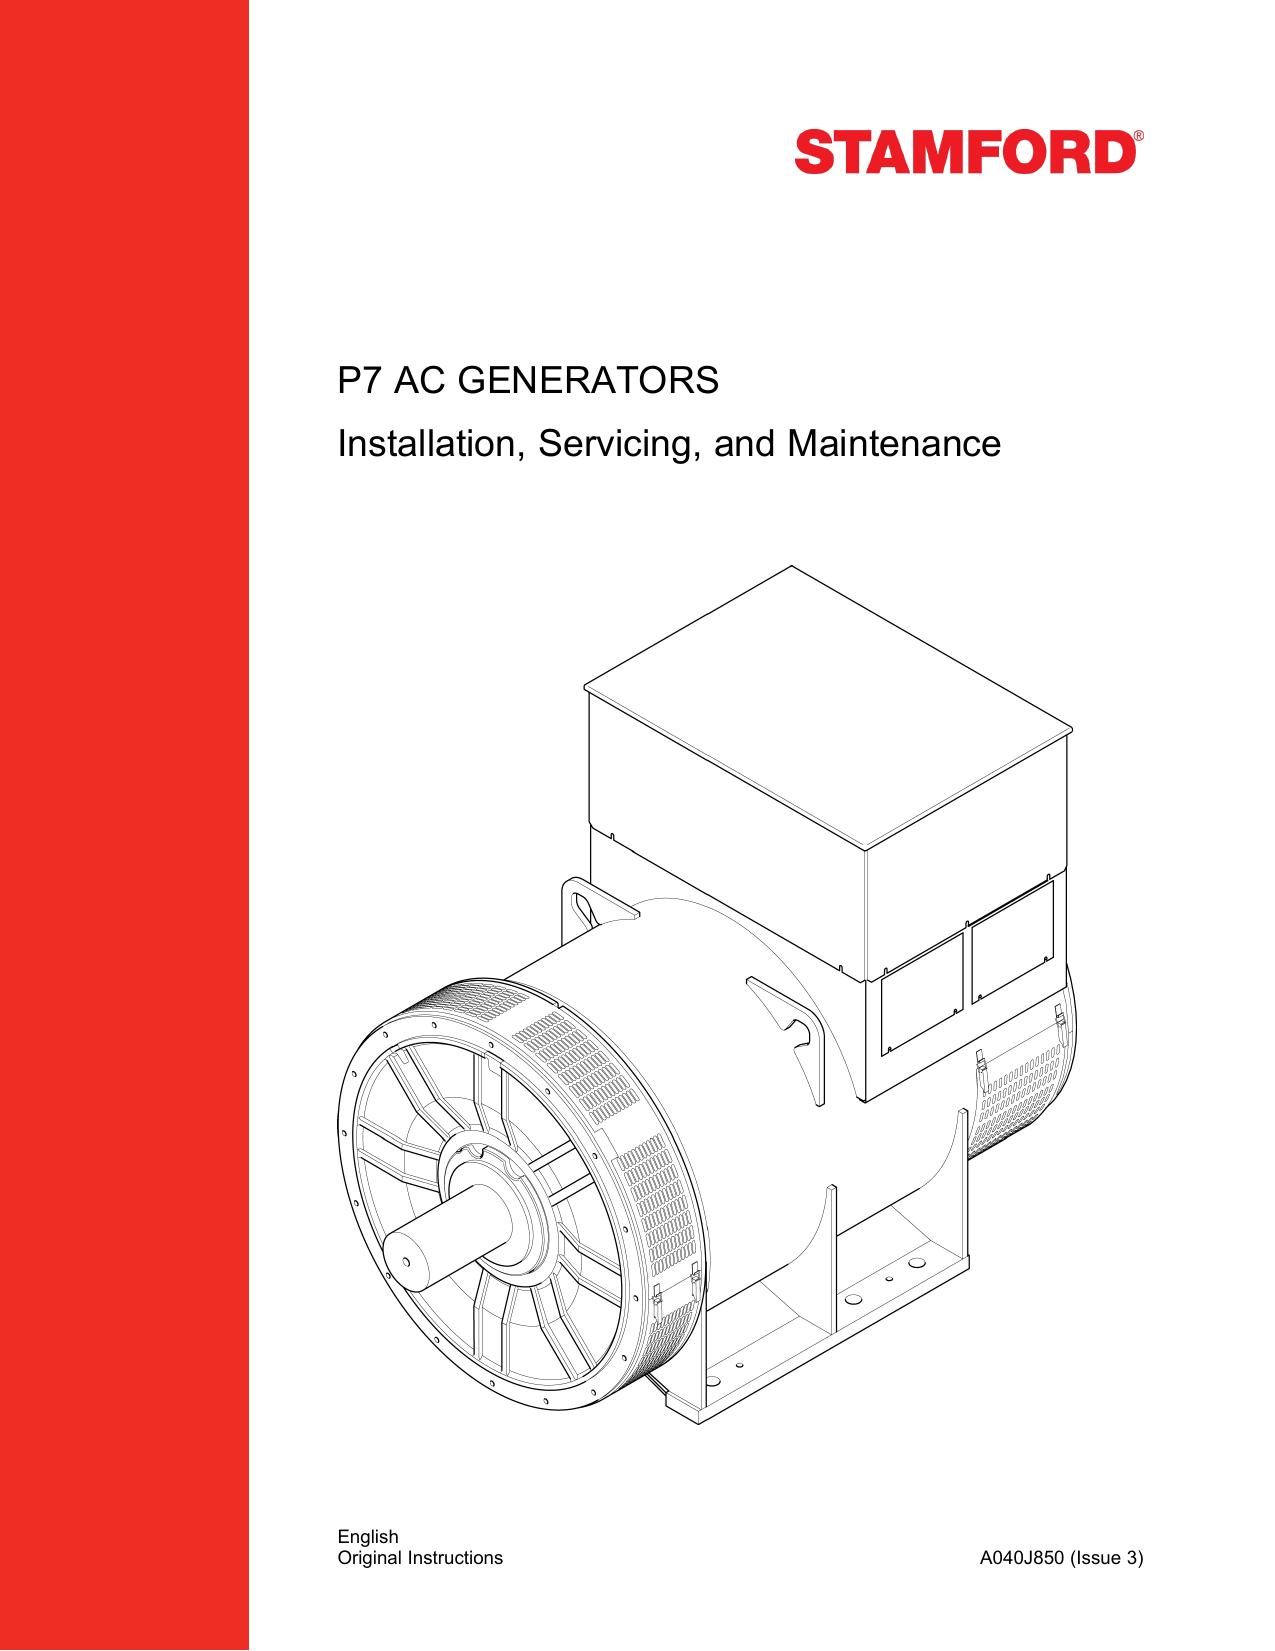 P7 Ac Generators Installation Servicing And Maintenance